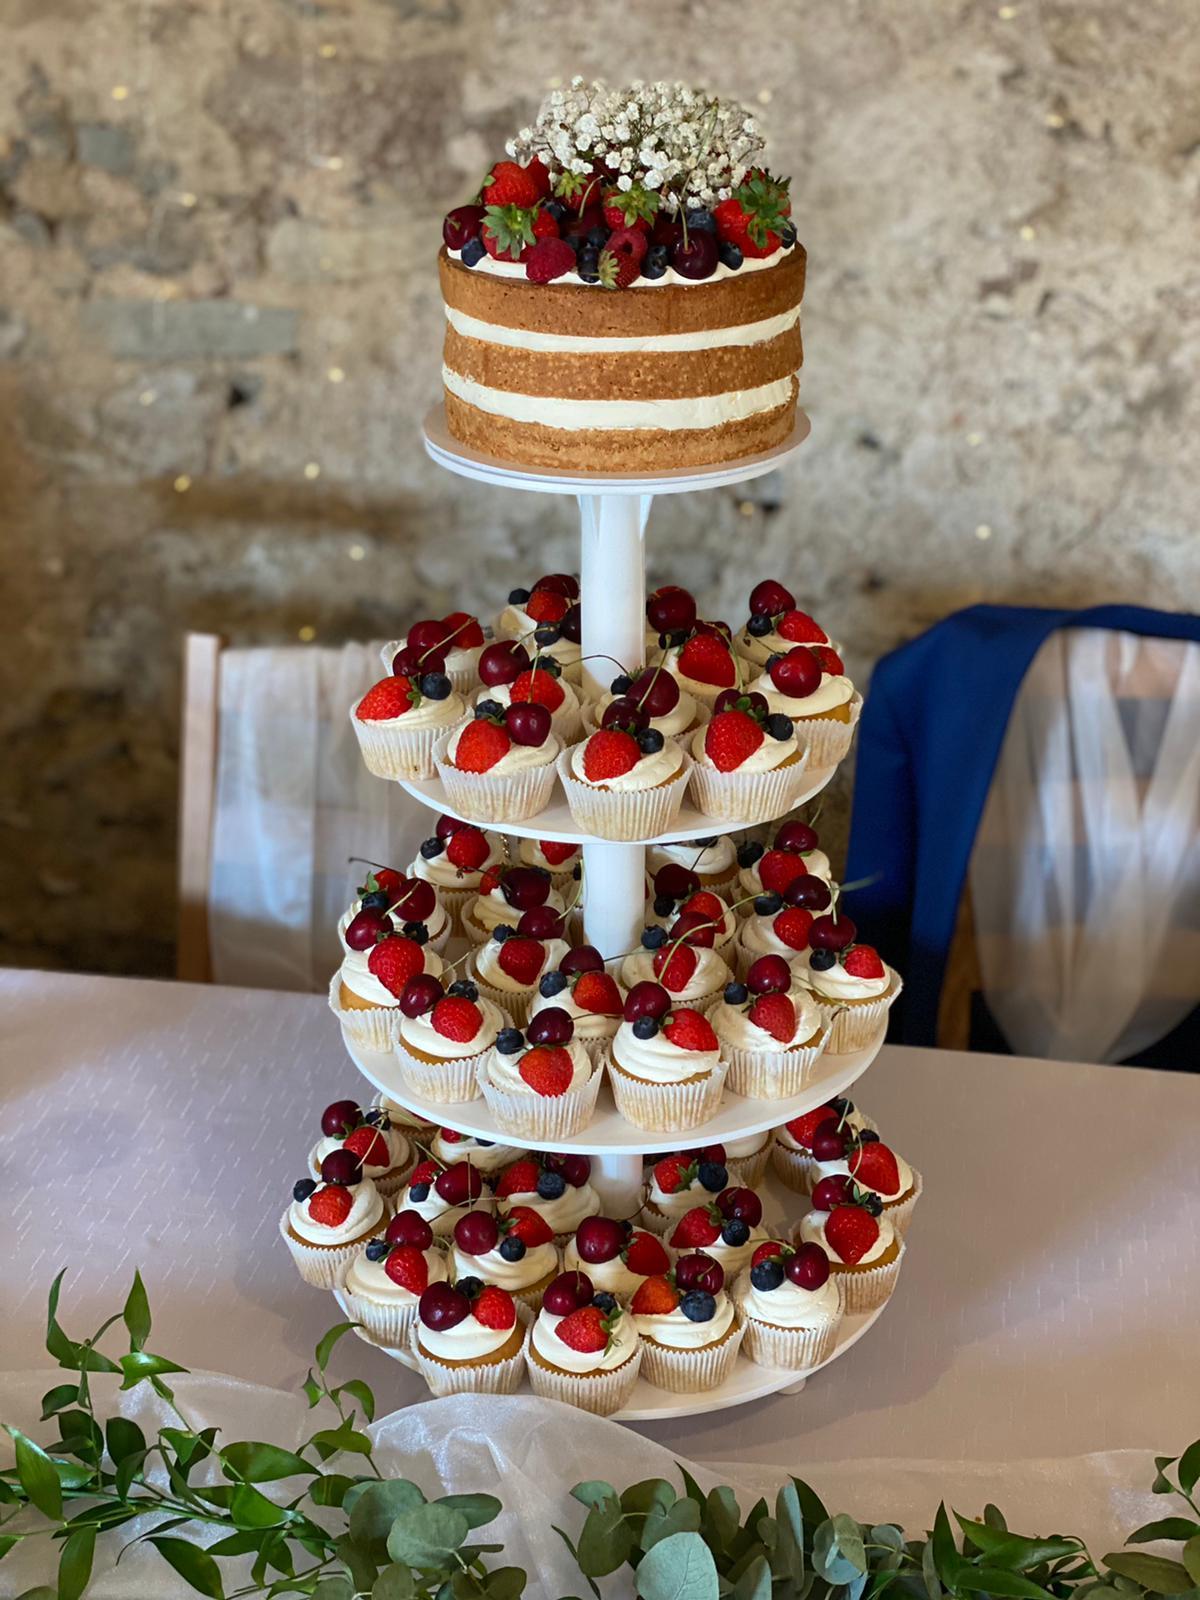 Etažér na svatebni dort či sweet bar - Obrázek č. 1